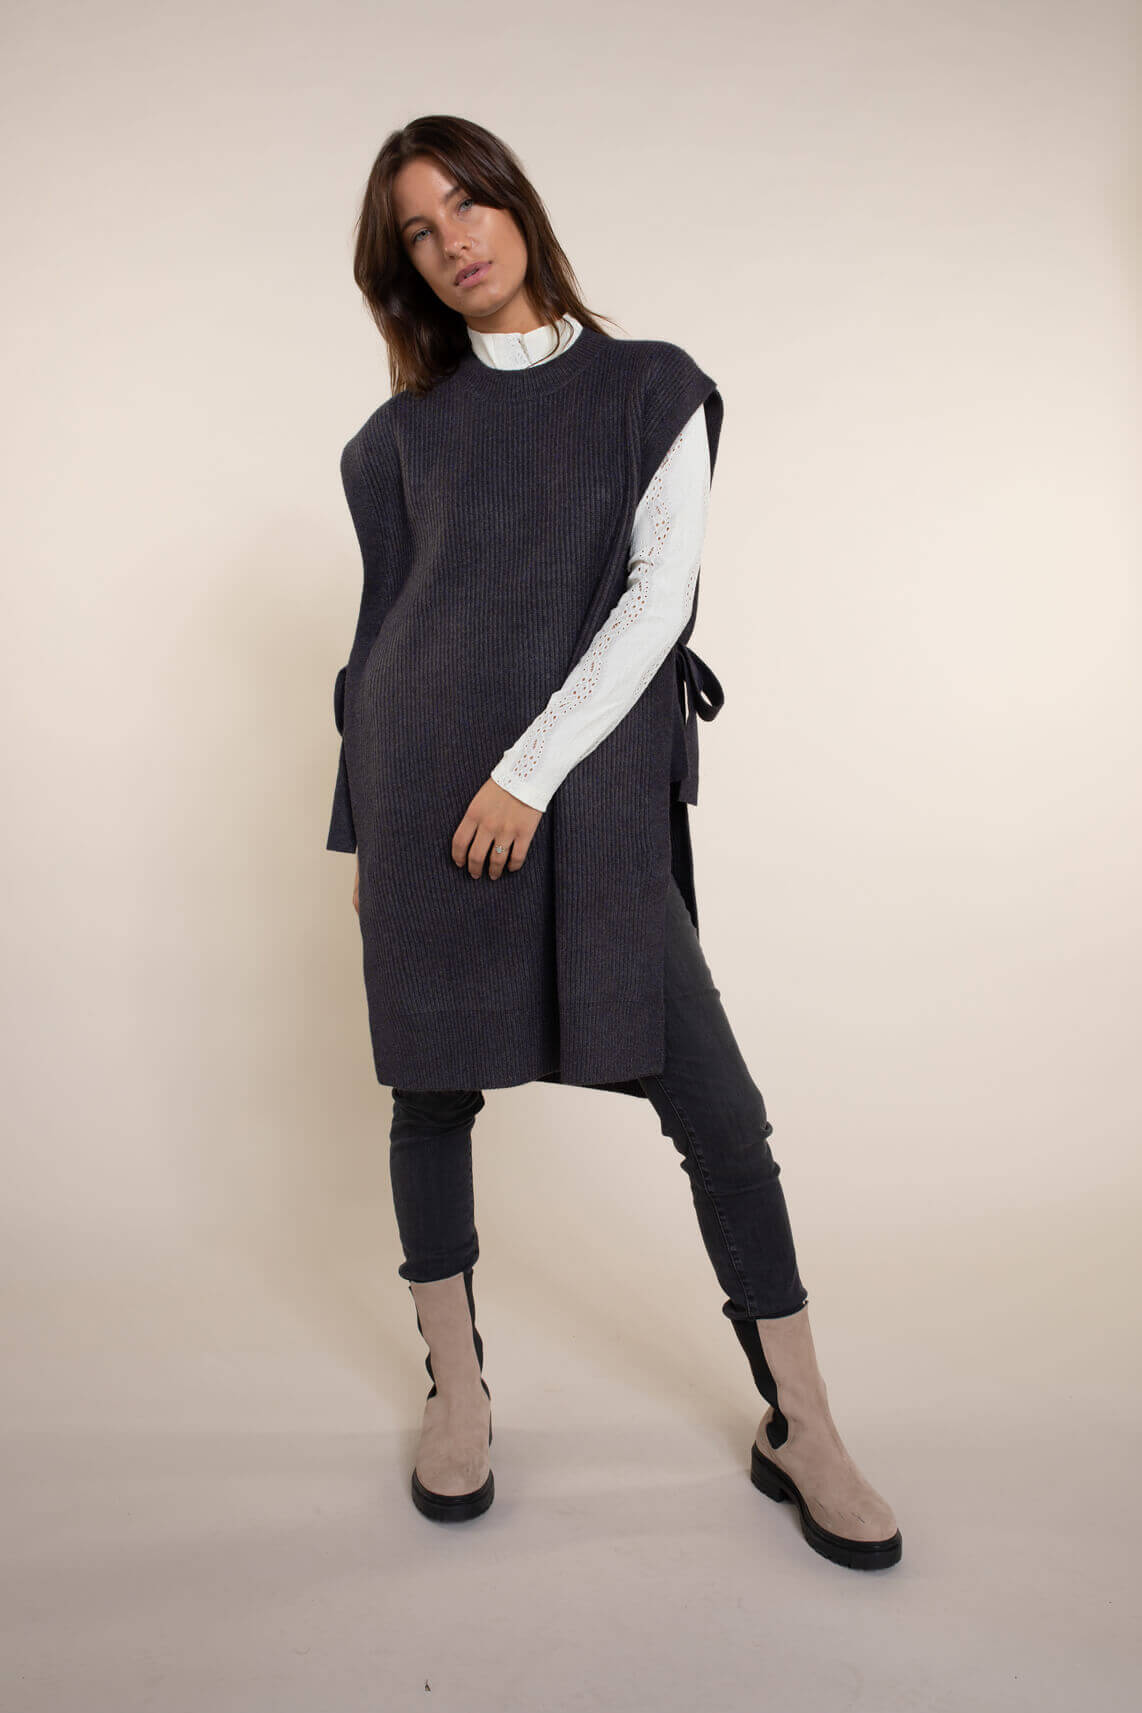 Co Couture Dames Anisa mouwloze trui Grijs